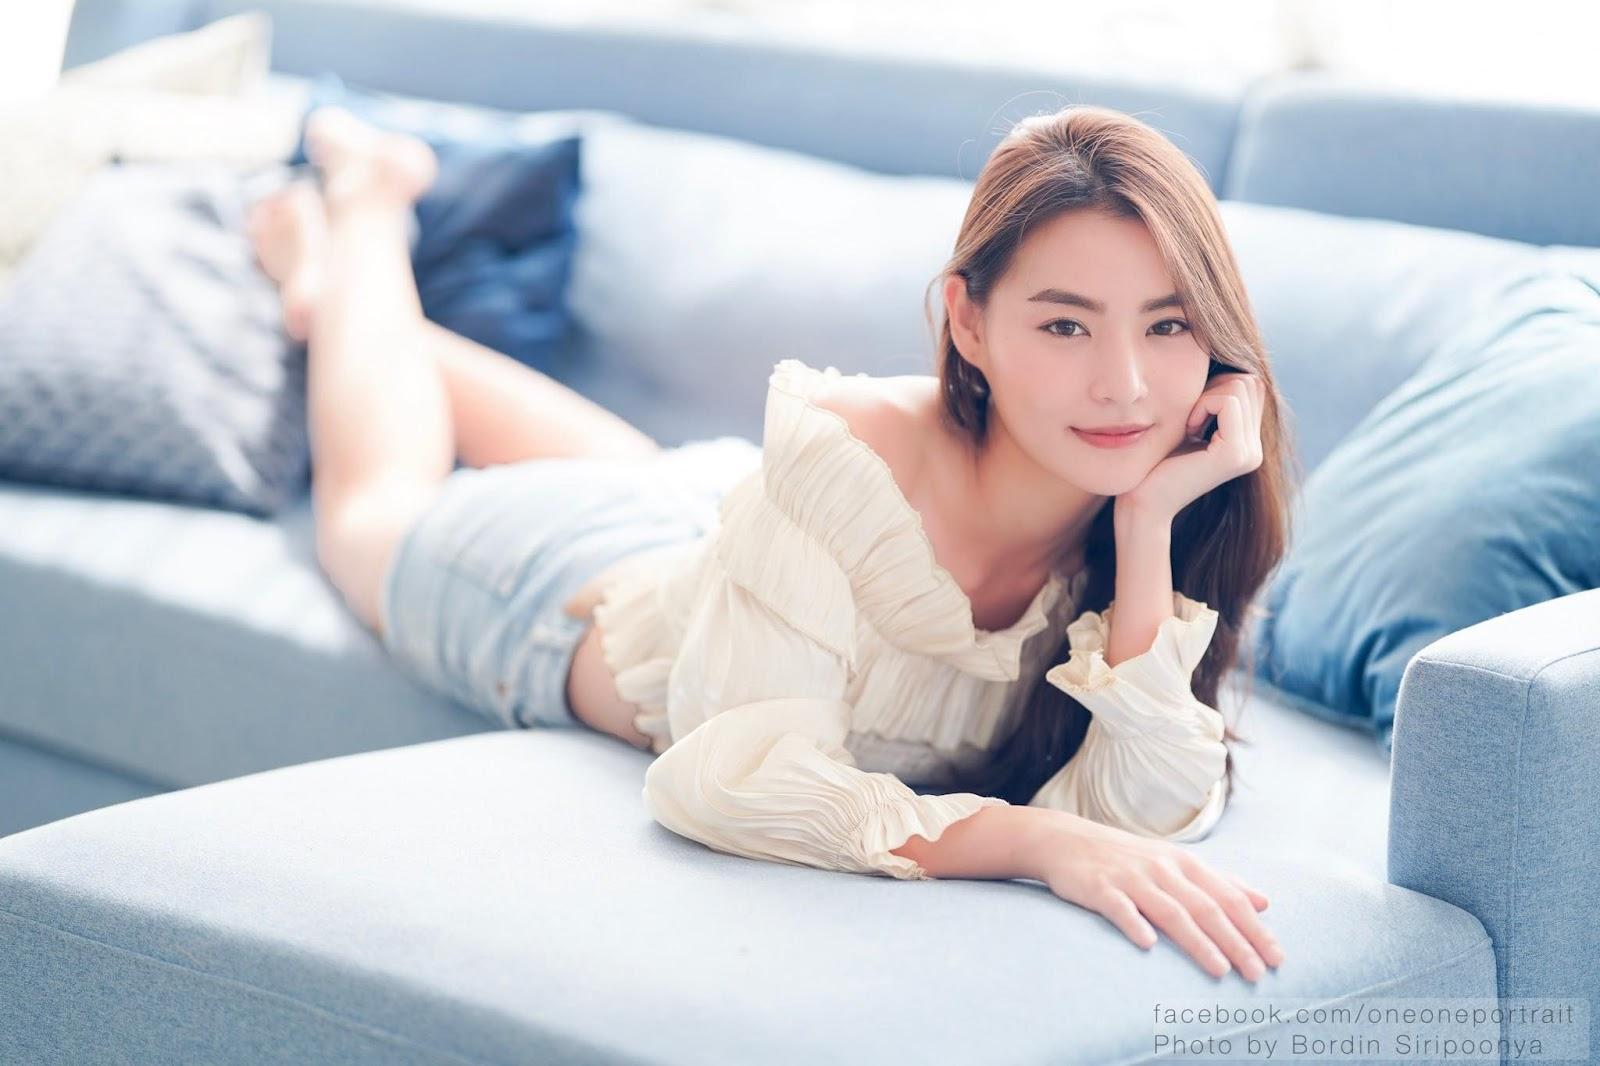 Beauty Thailand Kapook Phatchara vs Photo album Love you 3000 - Picture 10